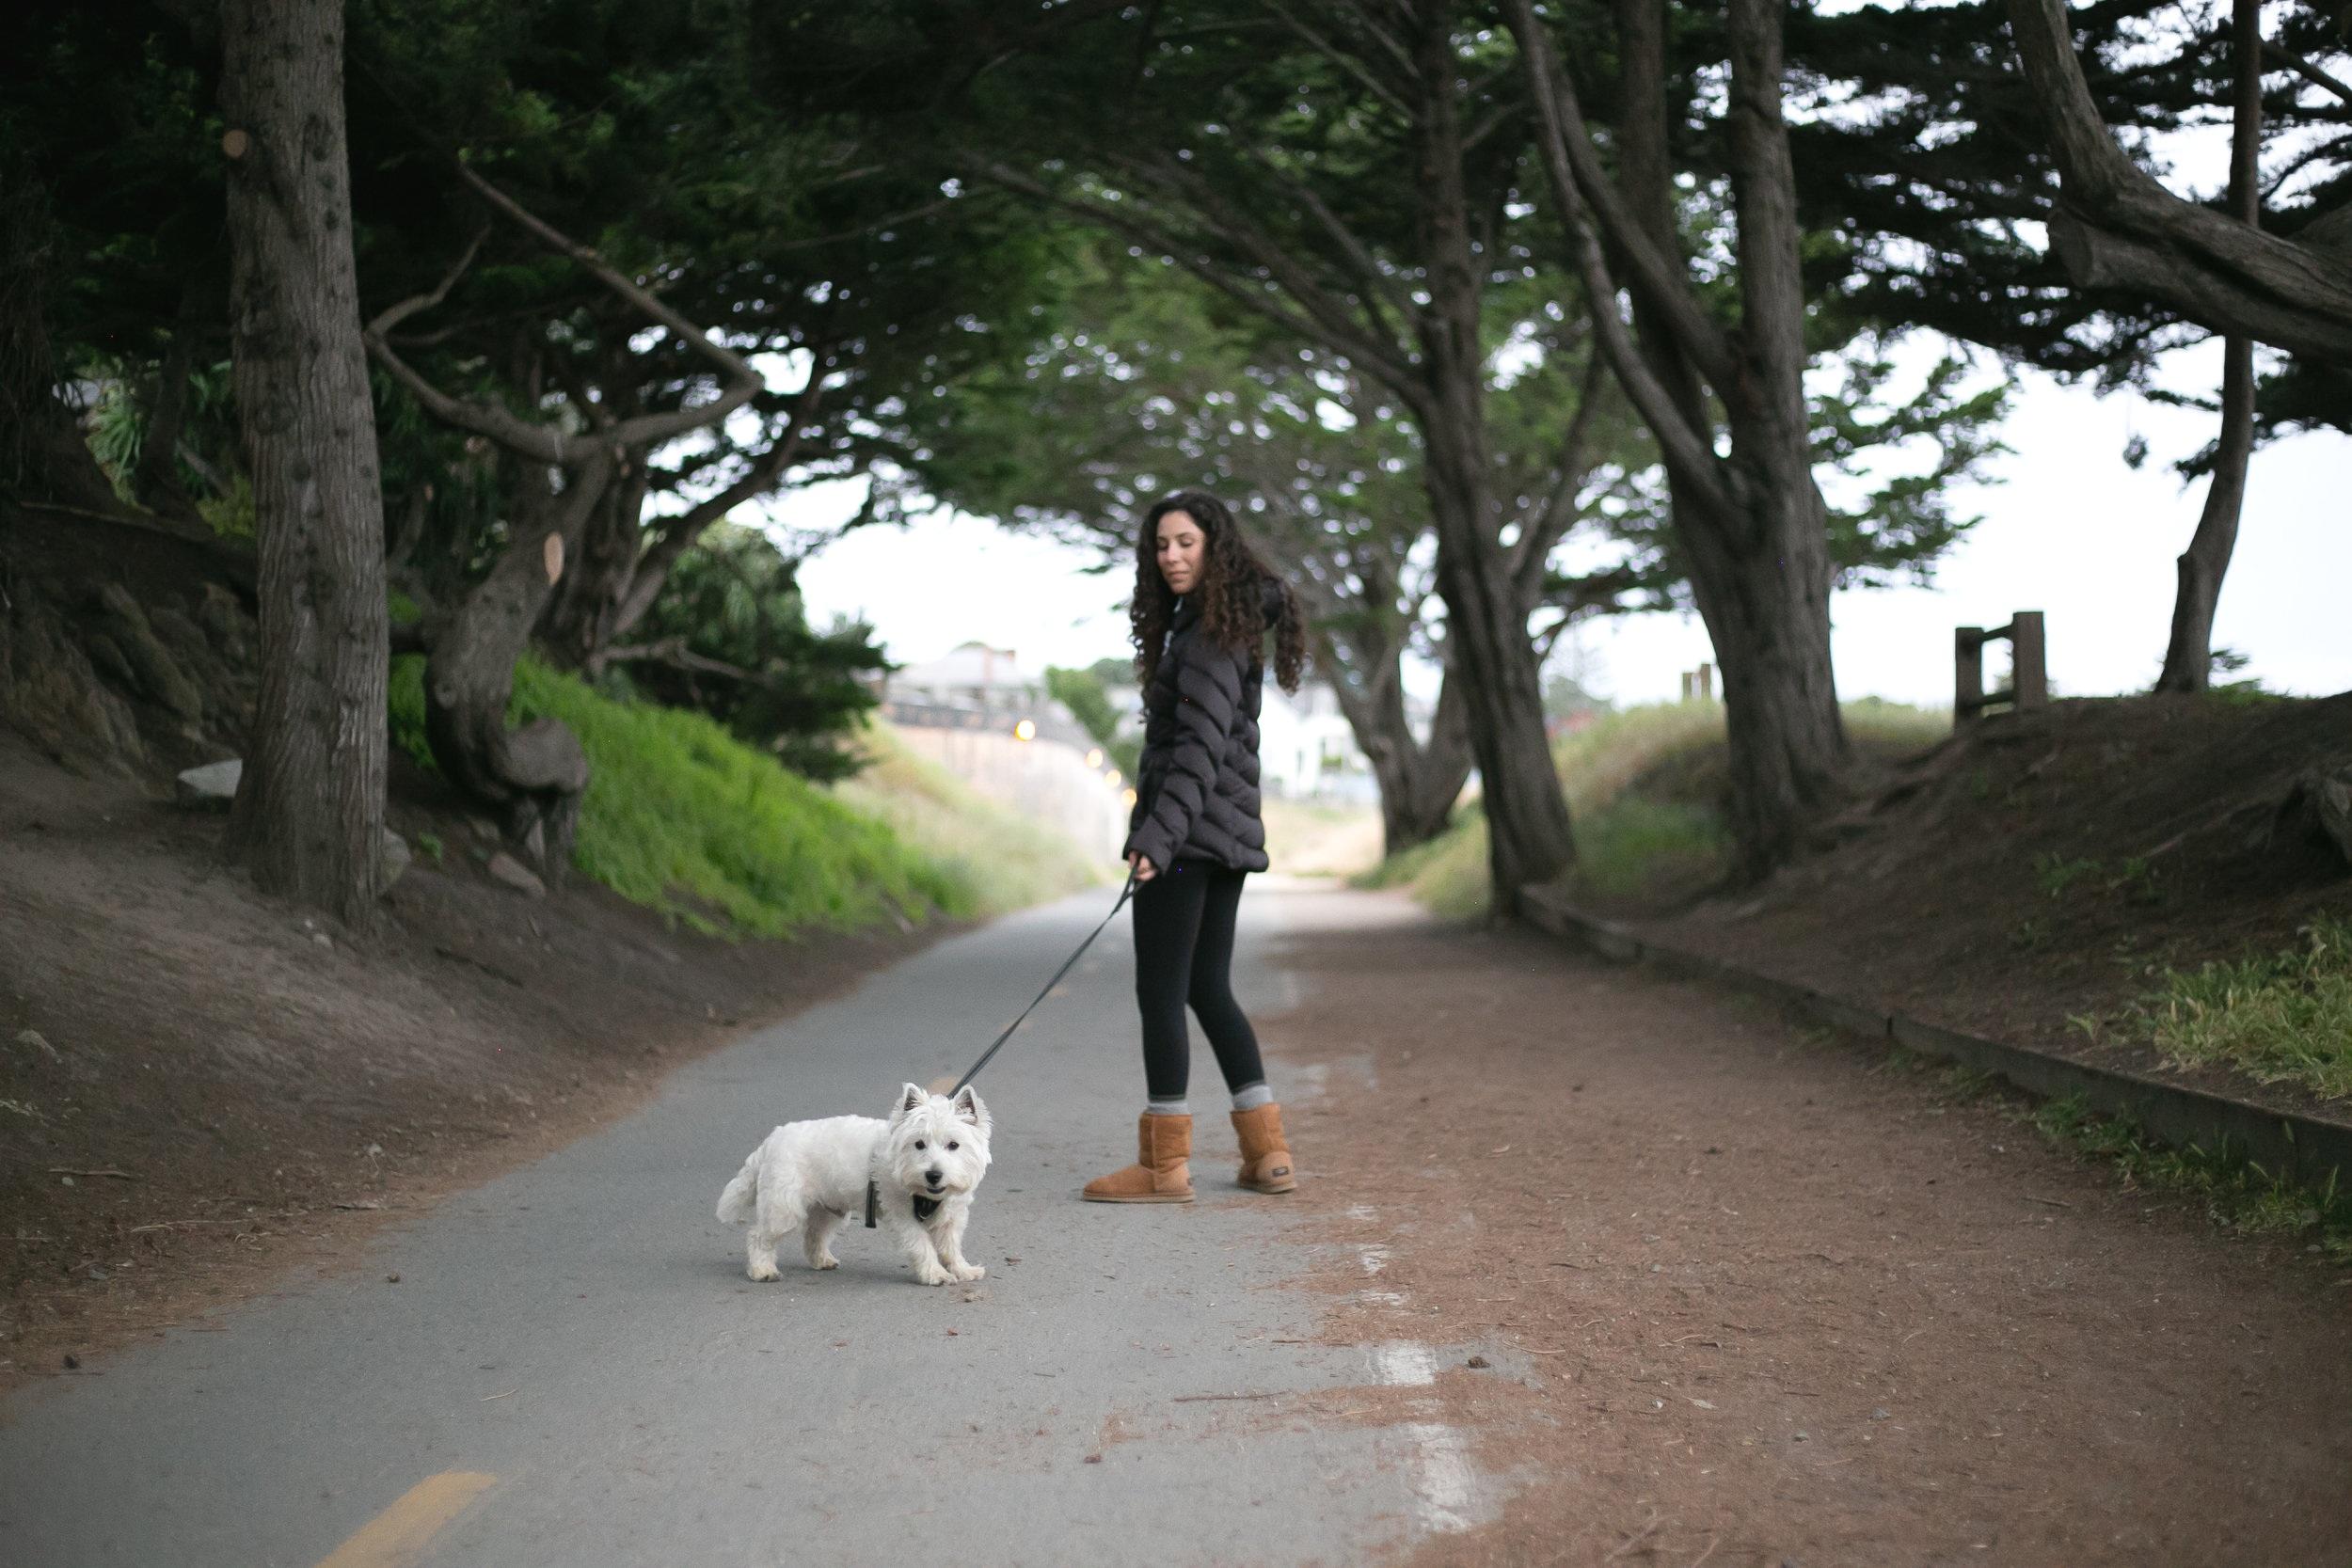 How to take a walk